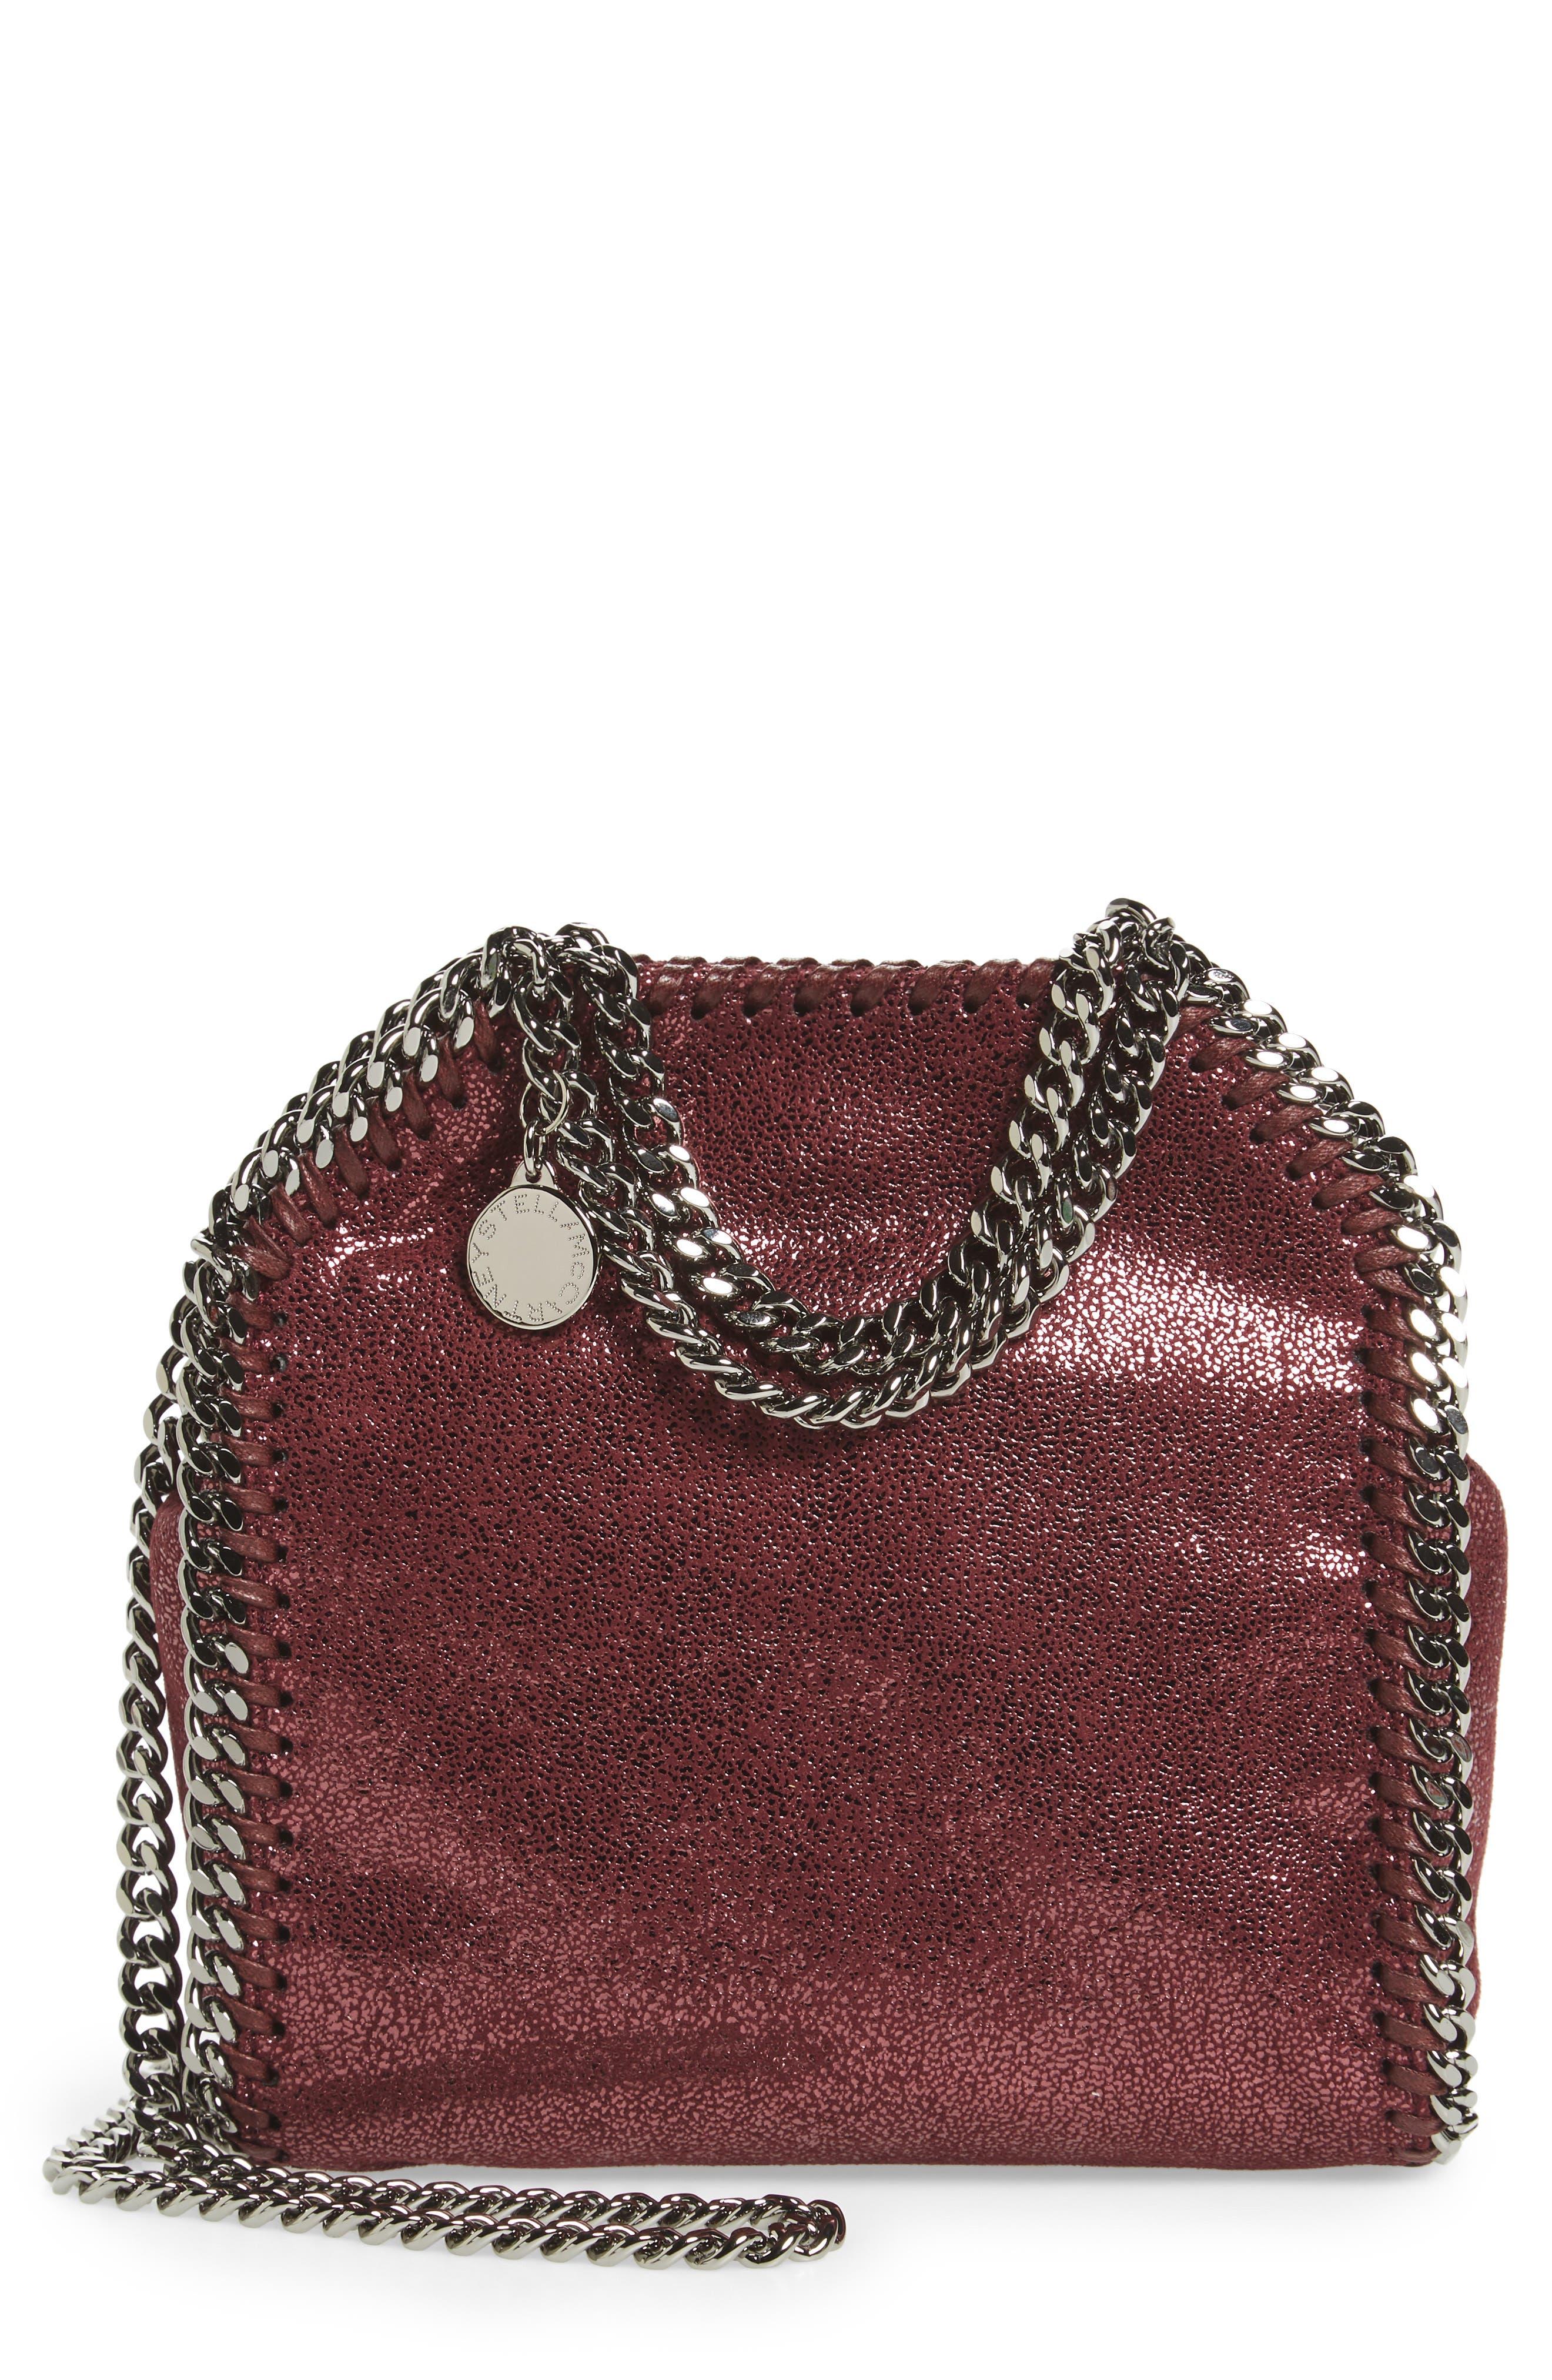 Stella McCartney 'Tiny Falabella' Metallic Faux Leather Crossbody Bag